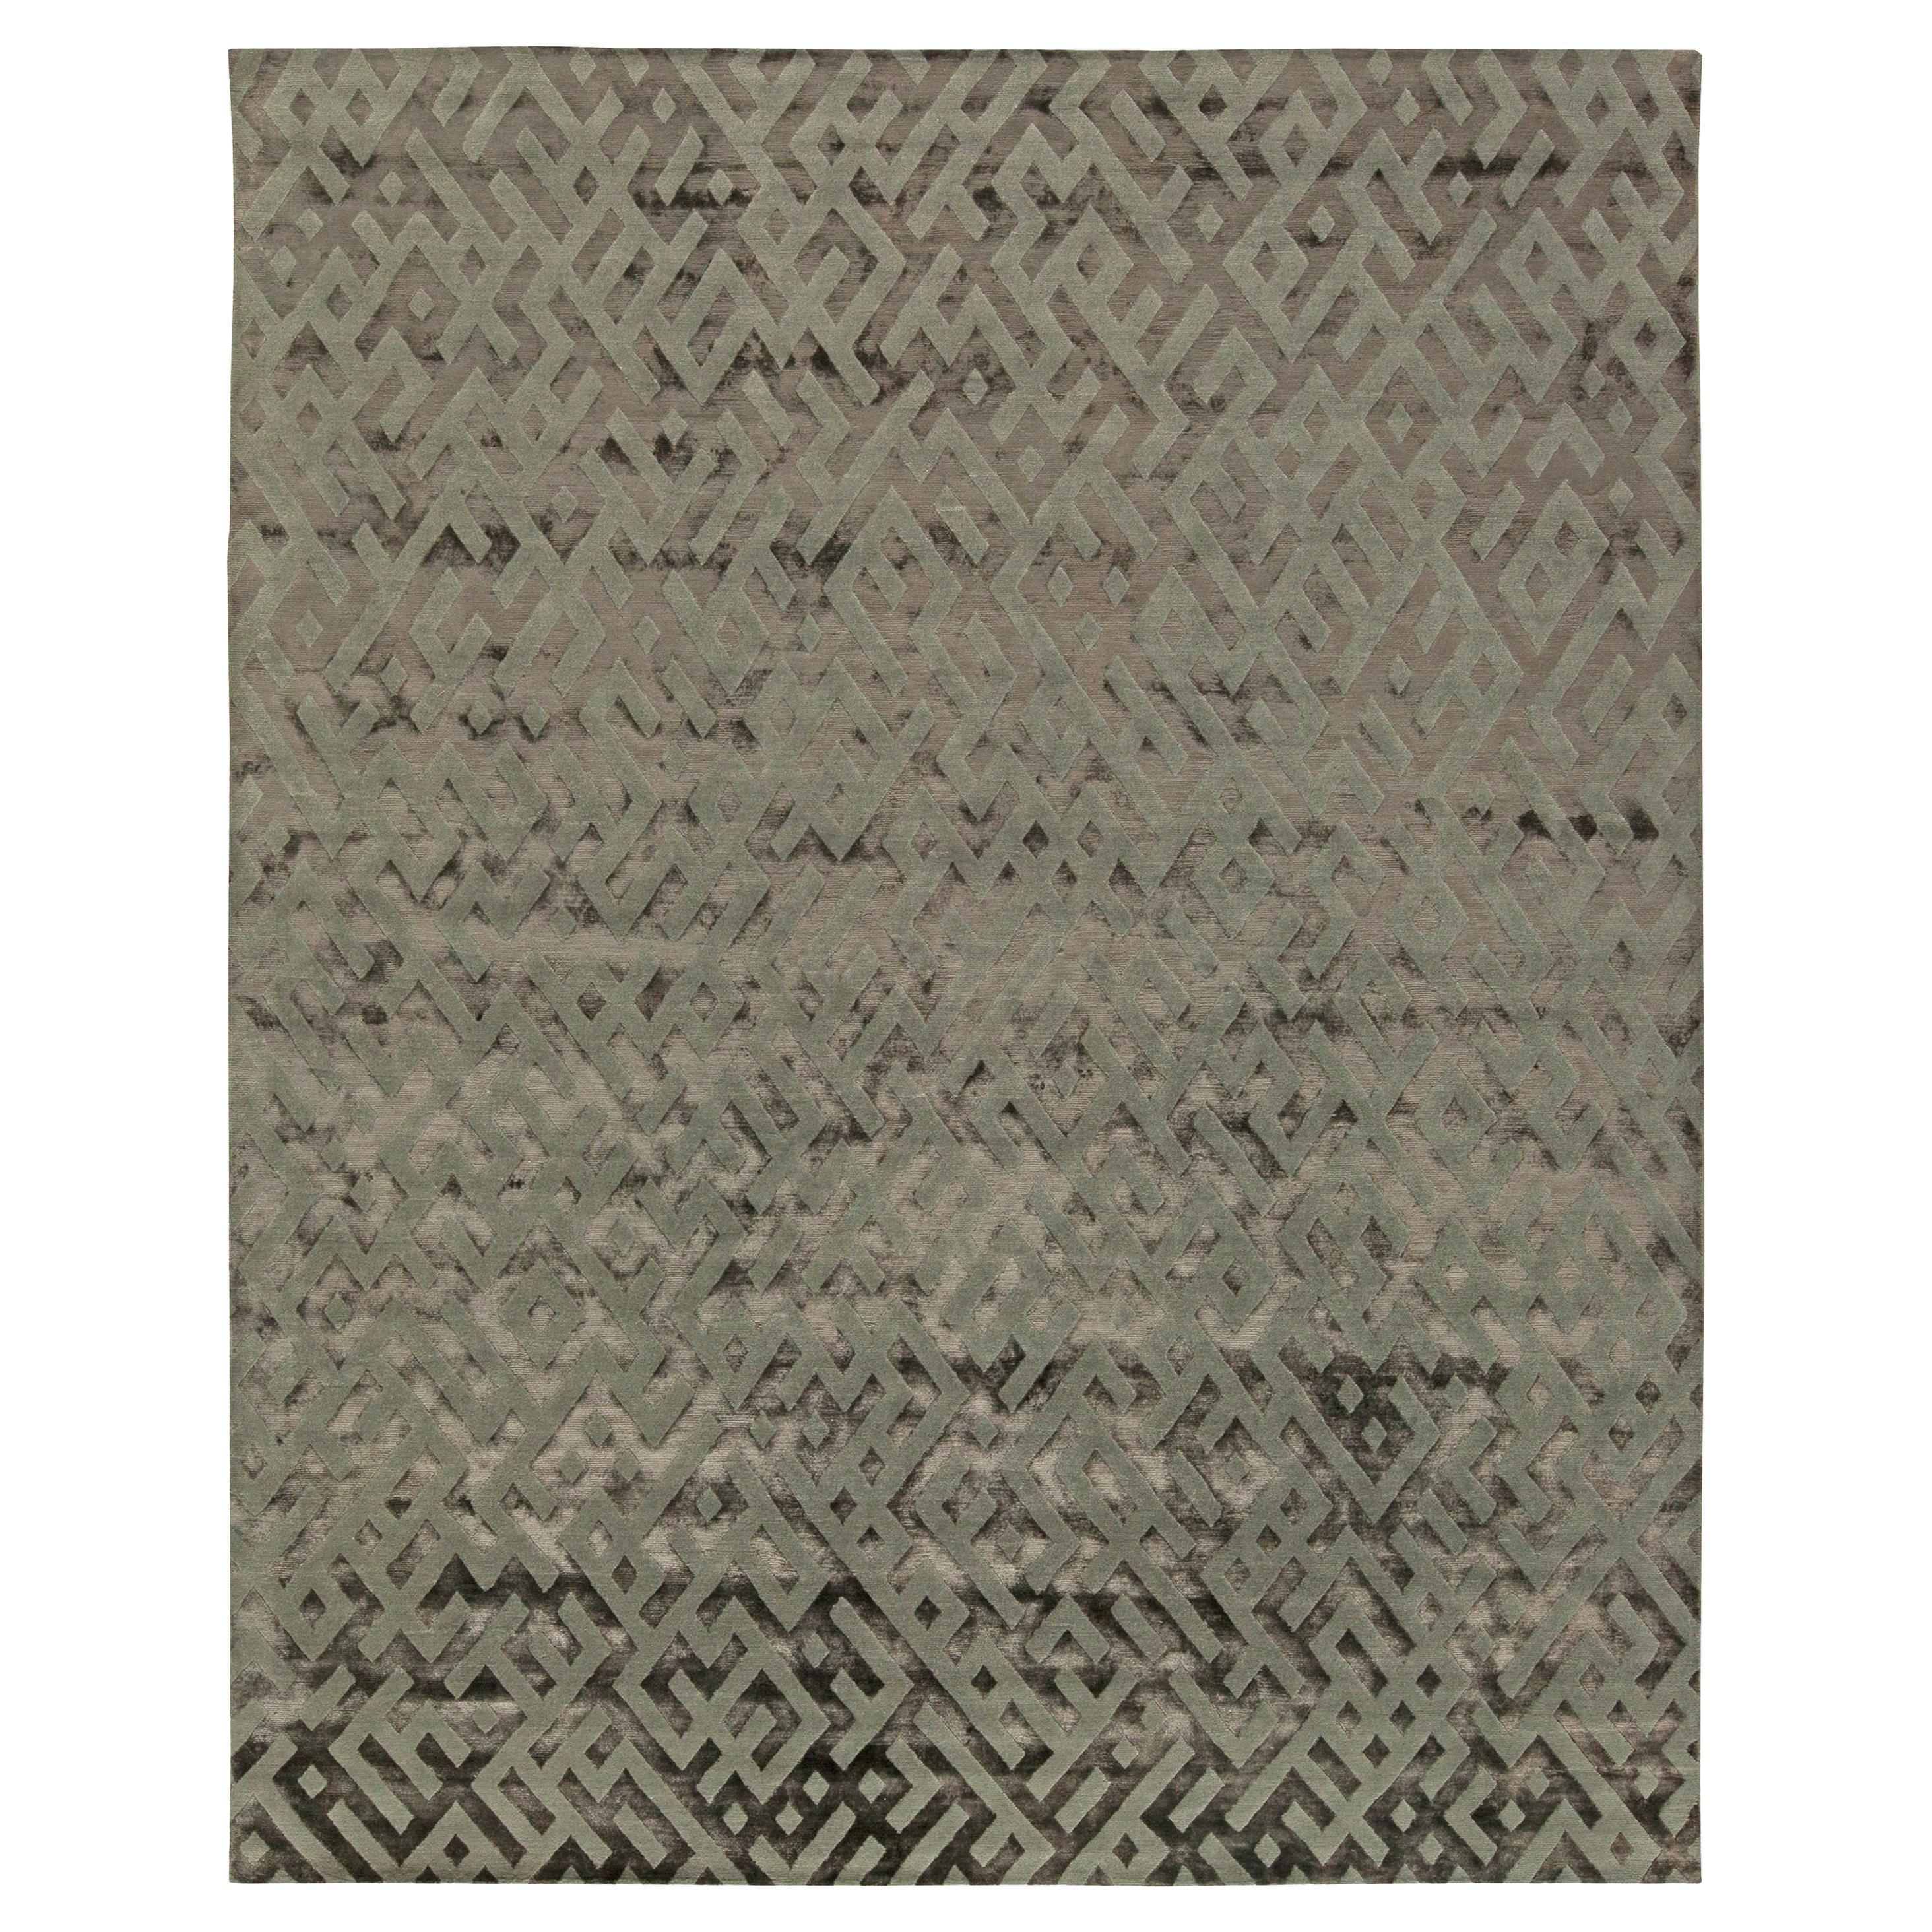 Doris Leslie Blau Collection Tibetan Geometric Gray Handmade Silk Rug